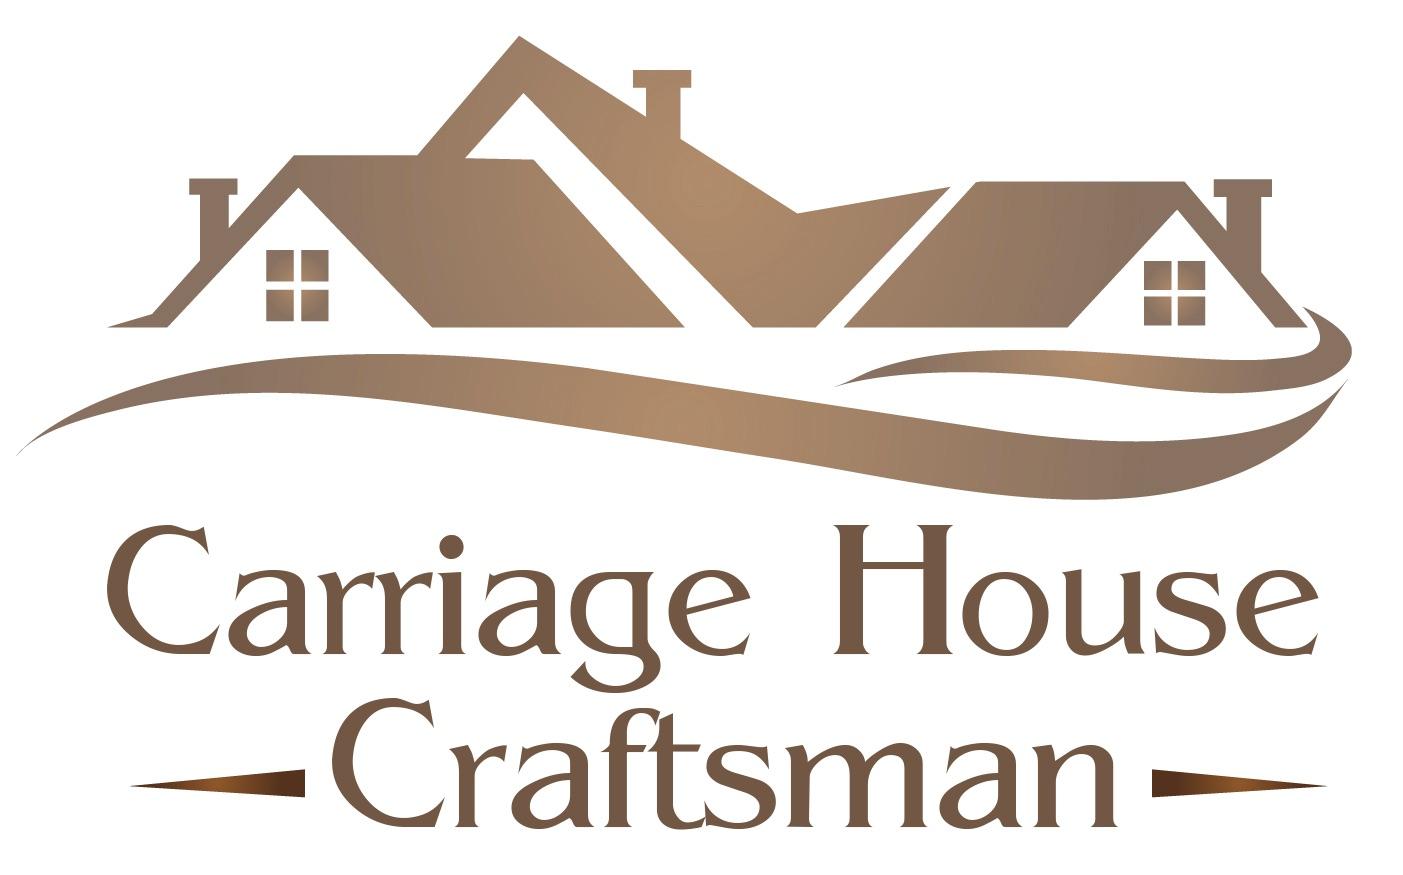 Carriage House Craftsman Logo 1